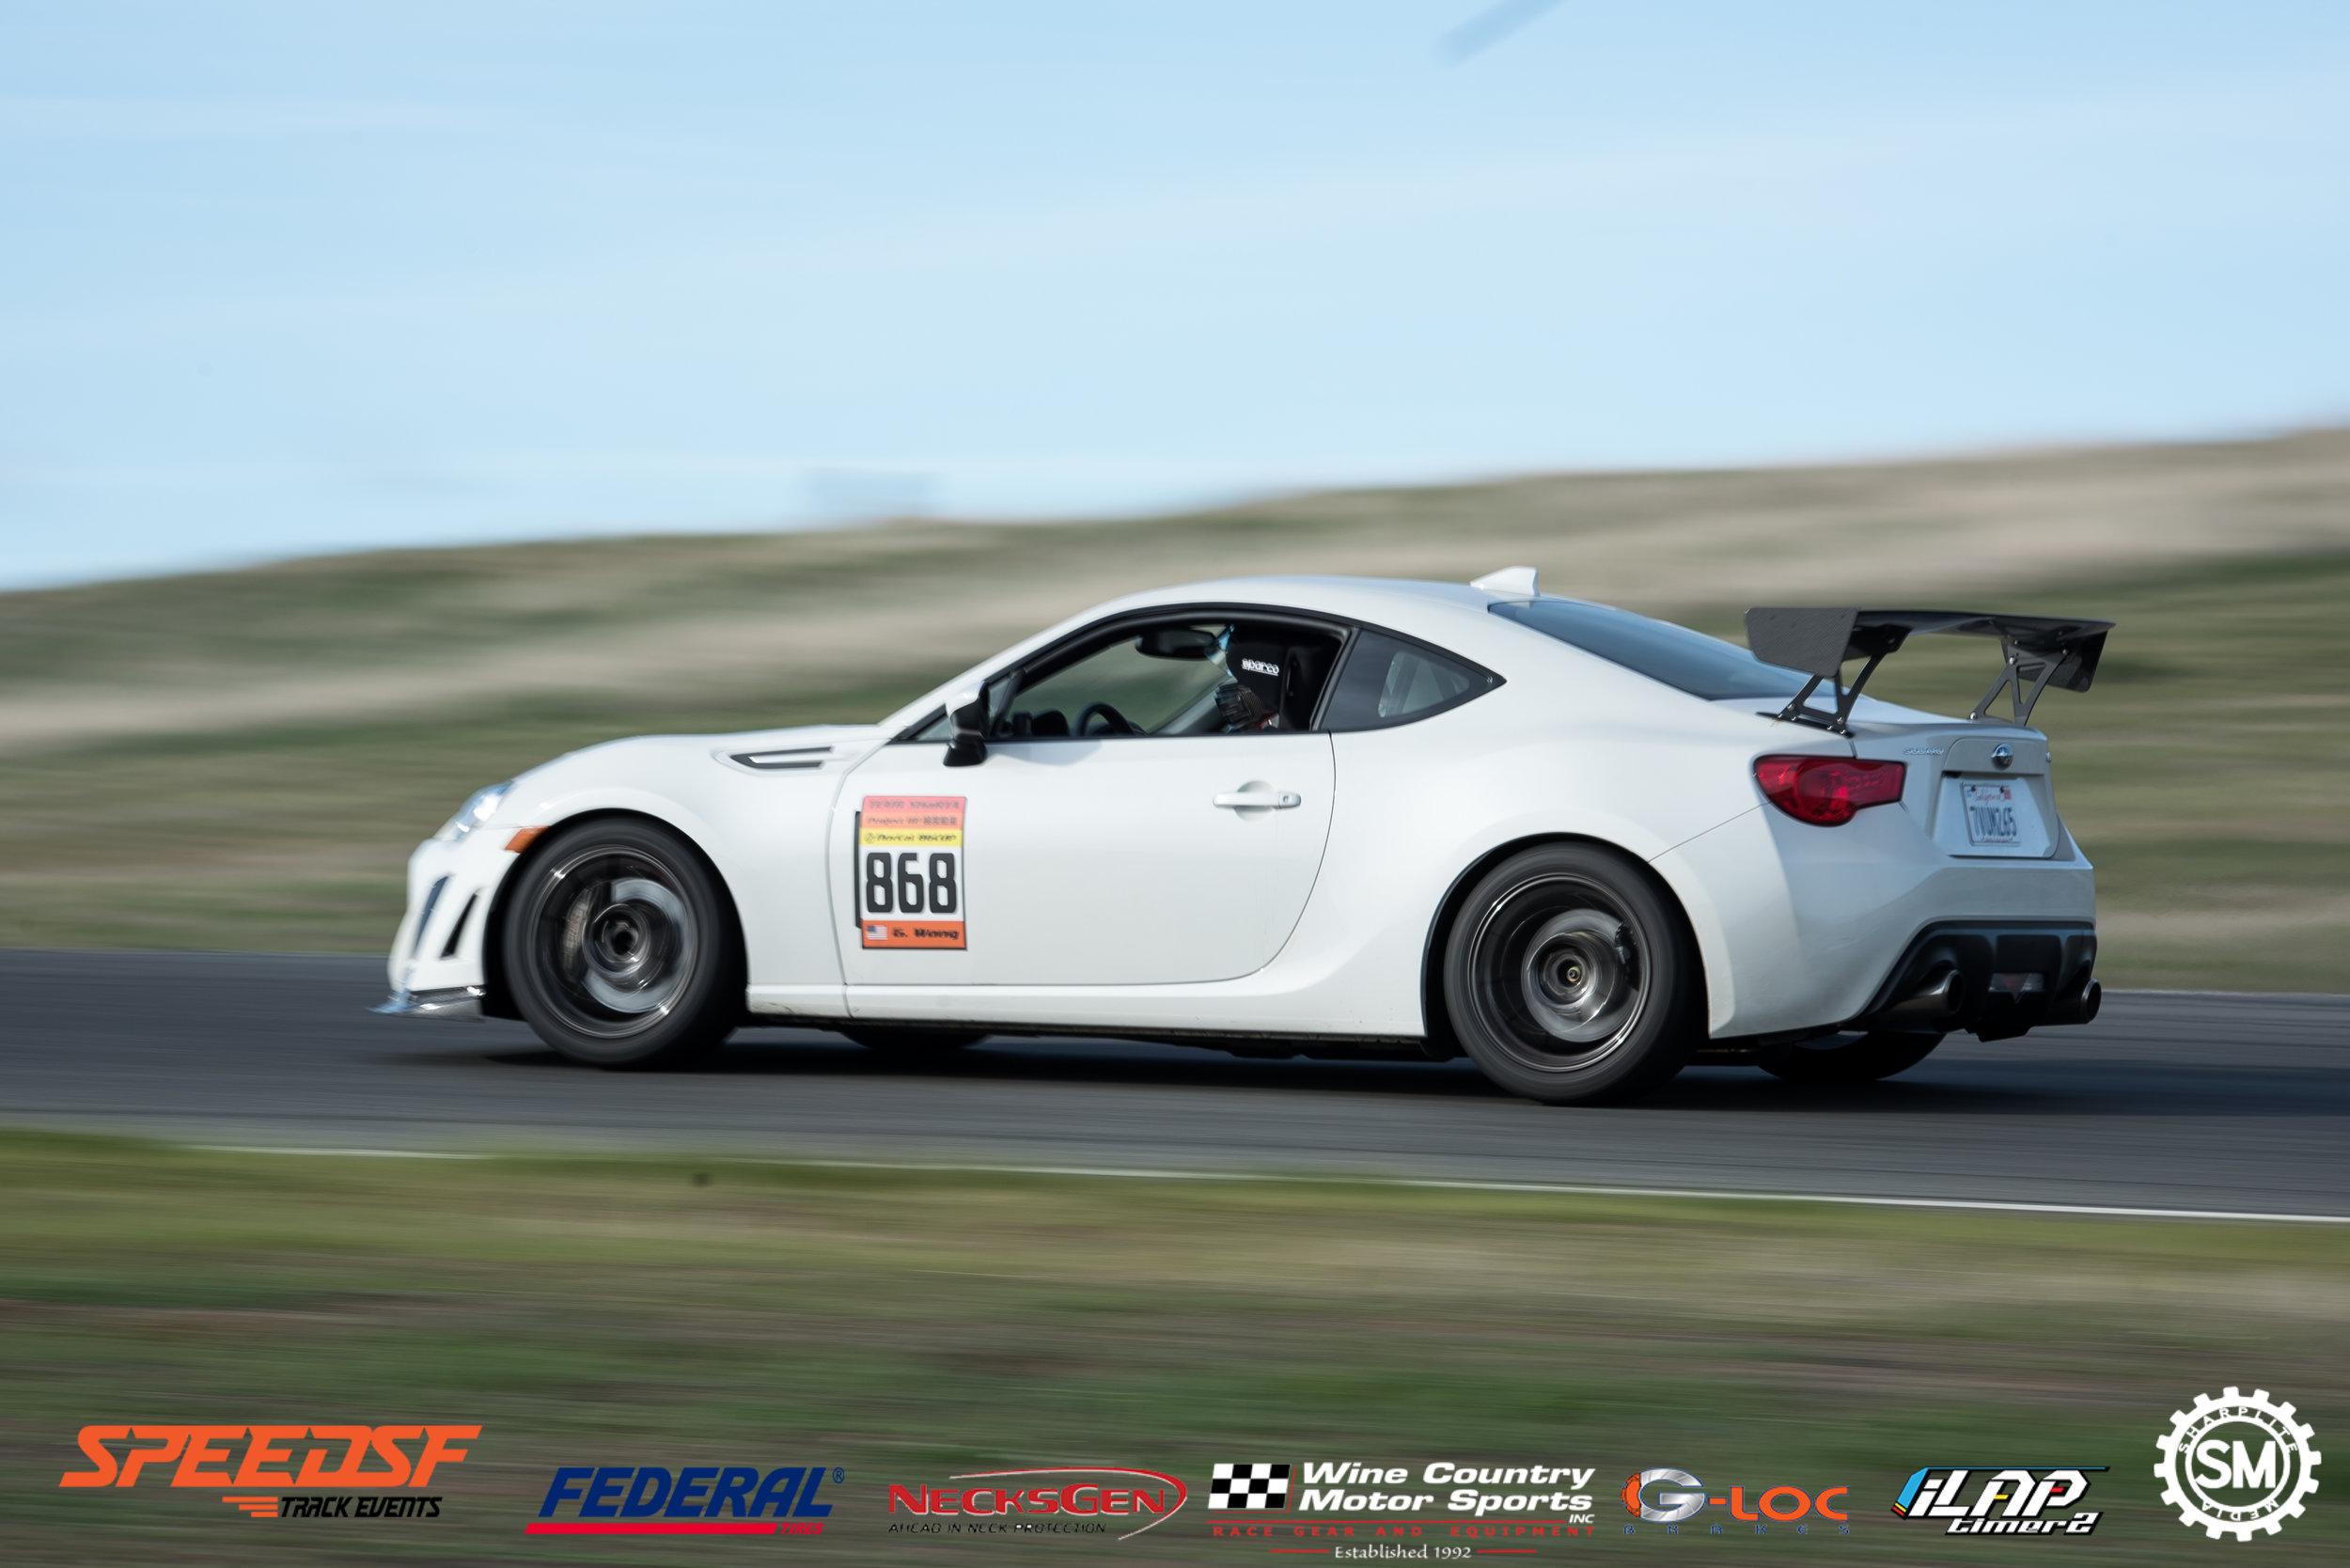 speedsf track saturday-1038.jpg